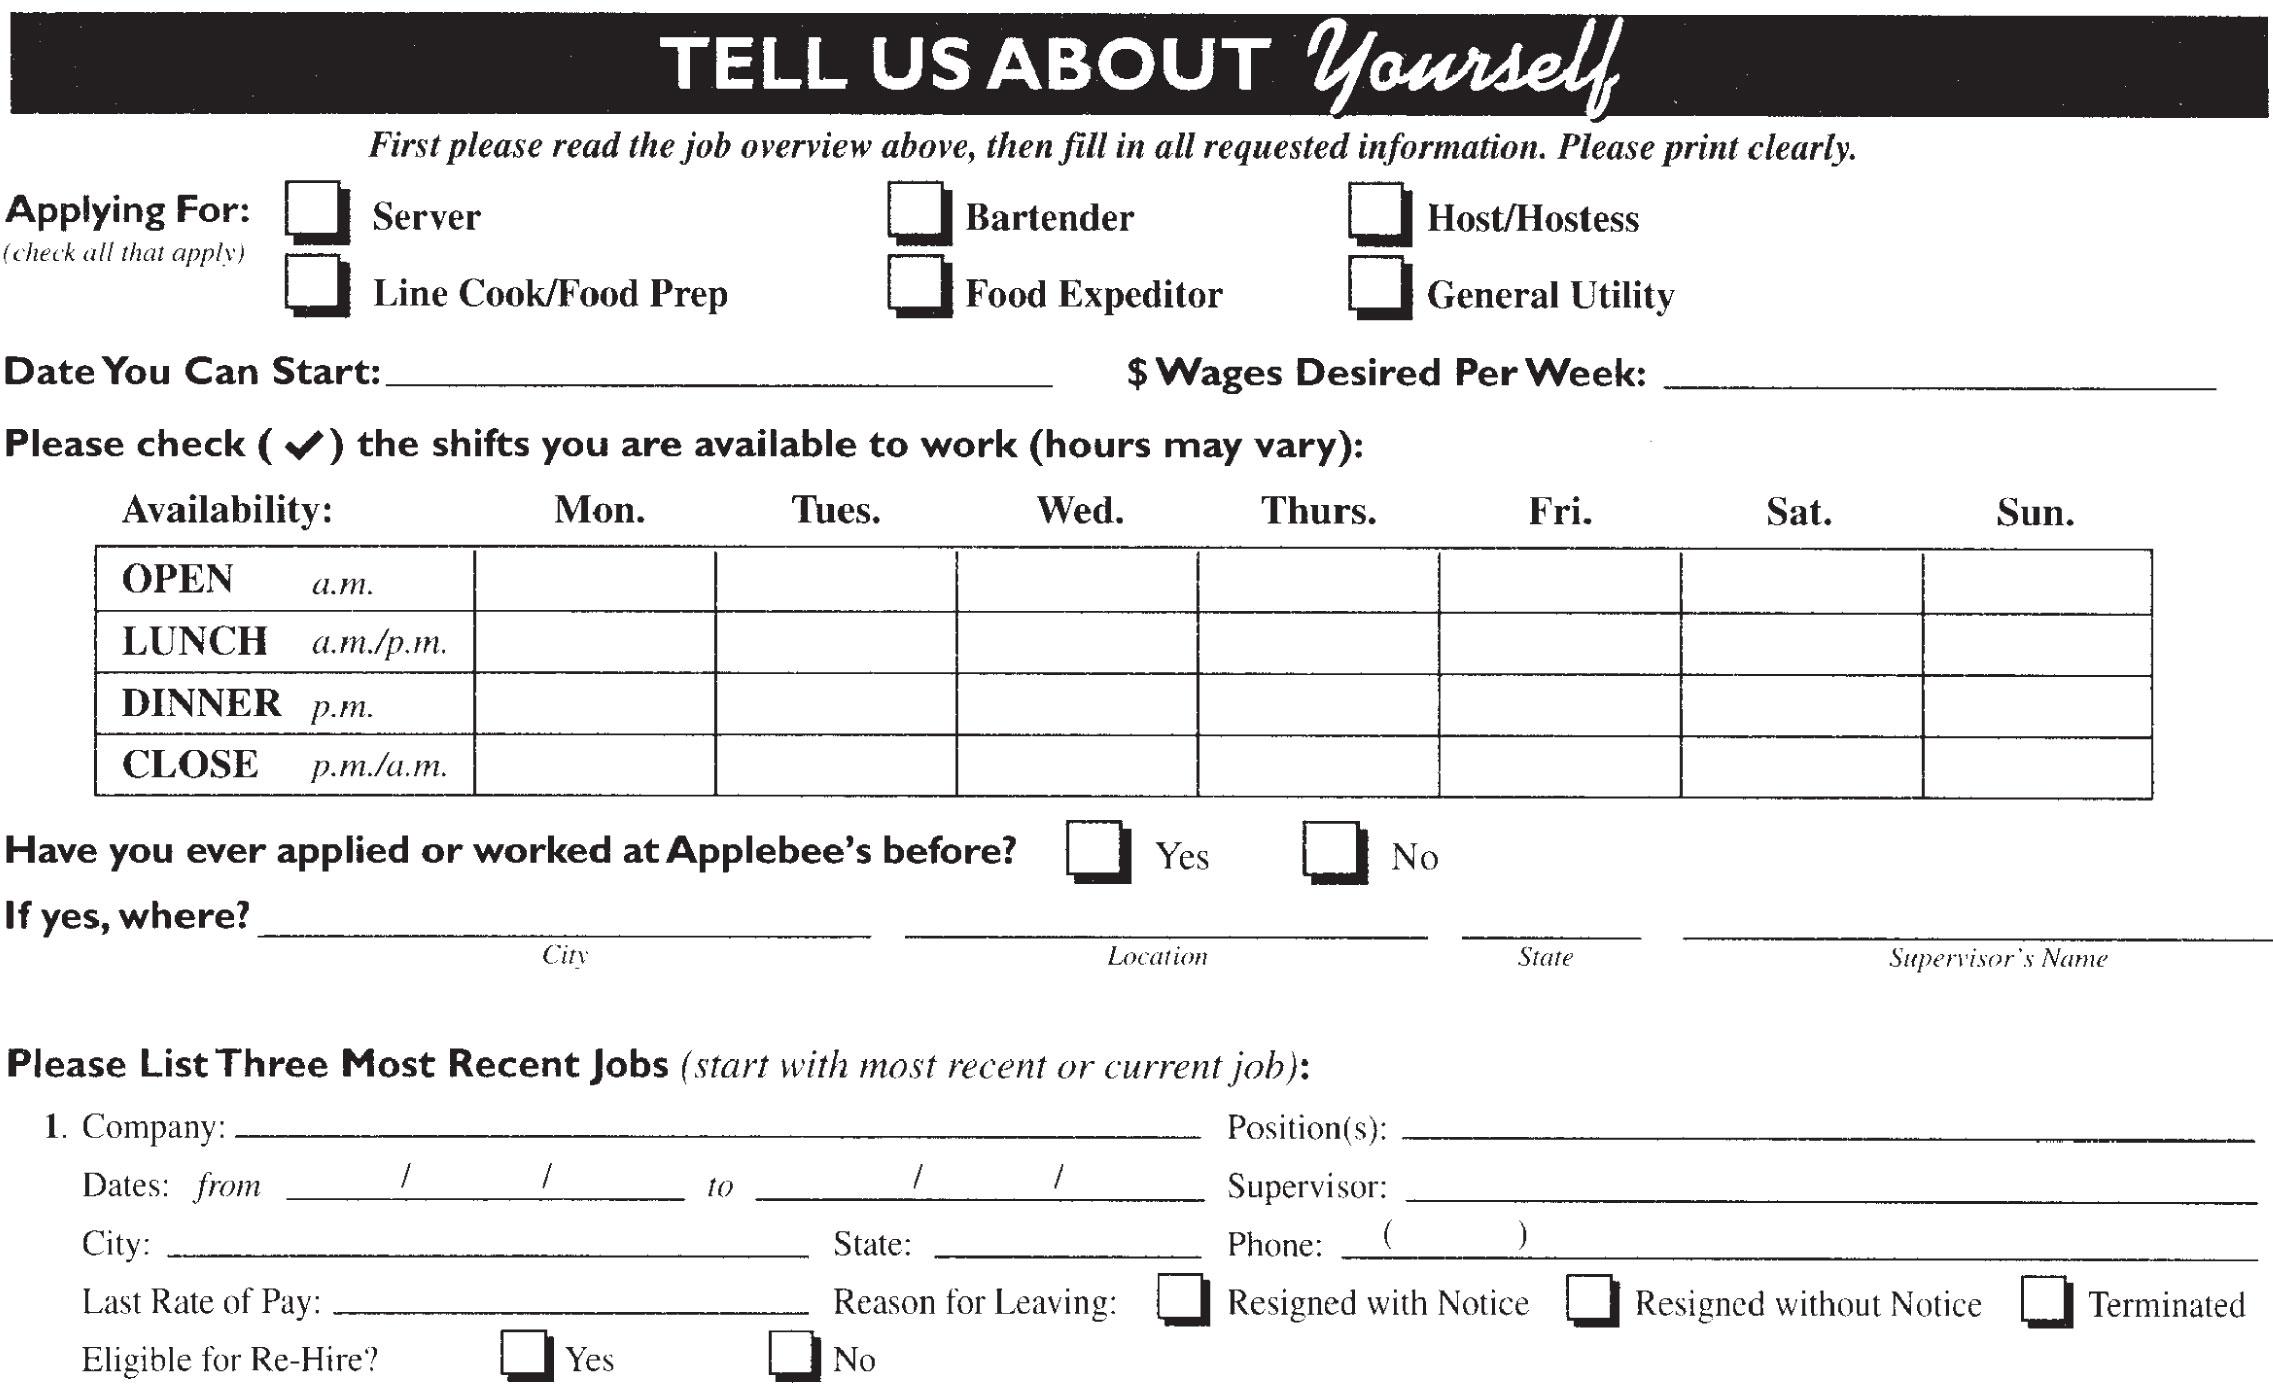 answers to mcdonalds application 2014 subway application